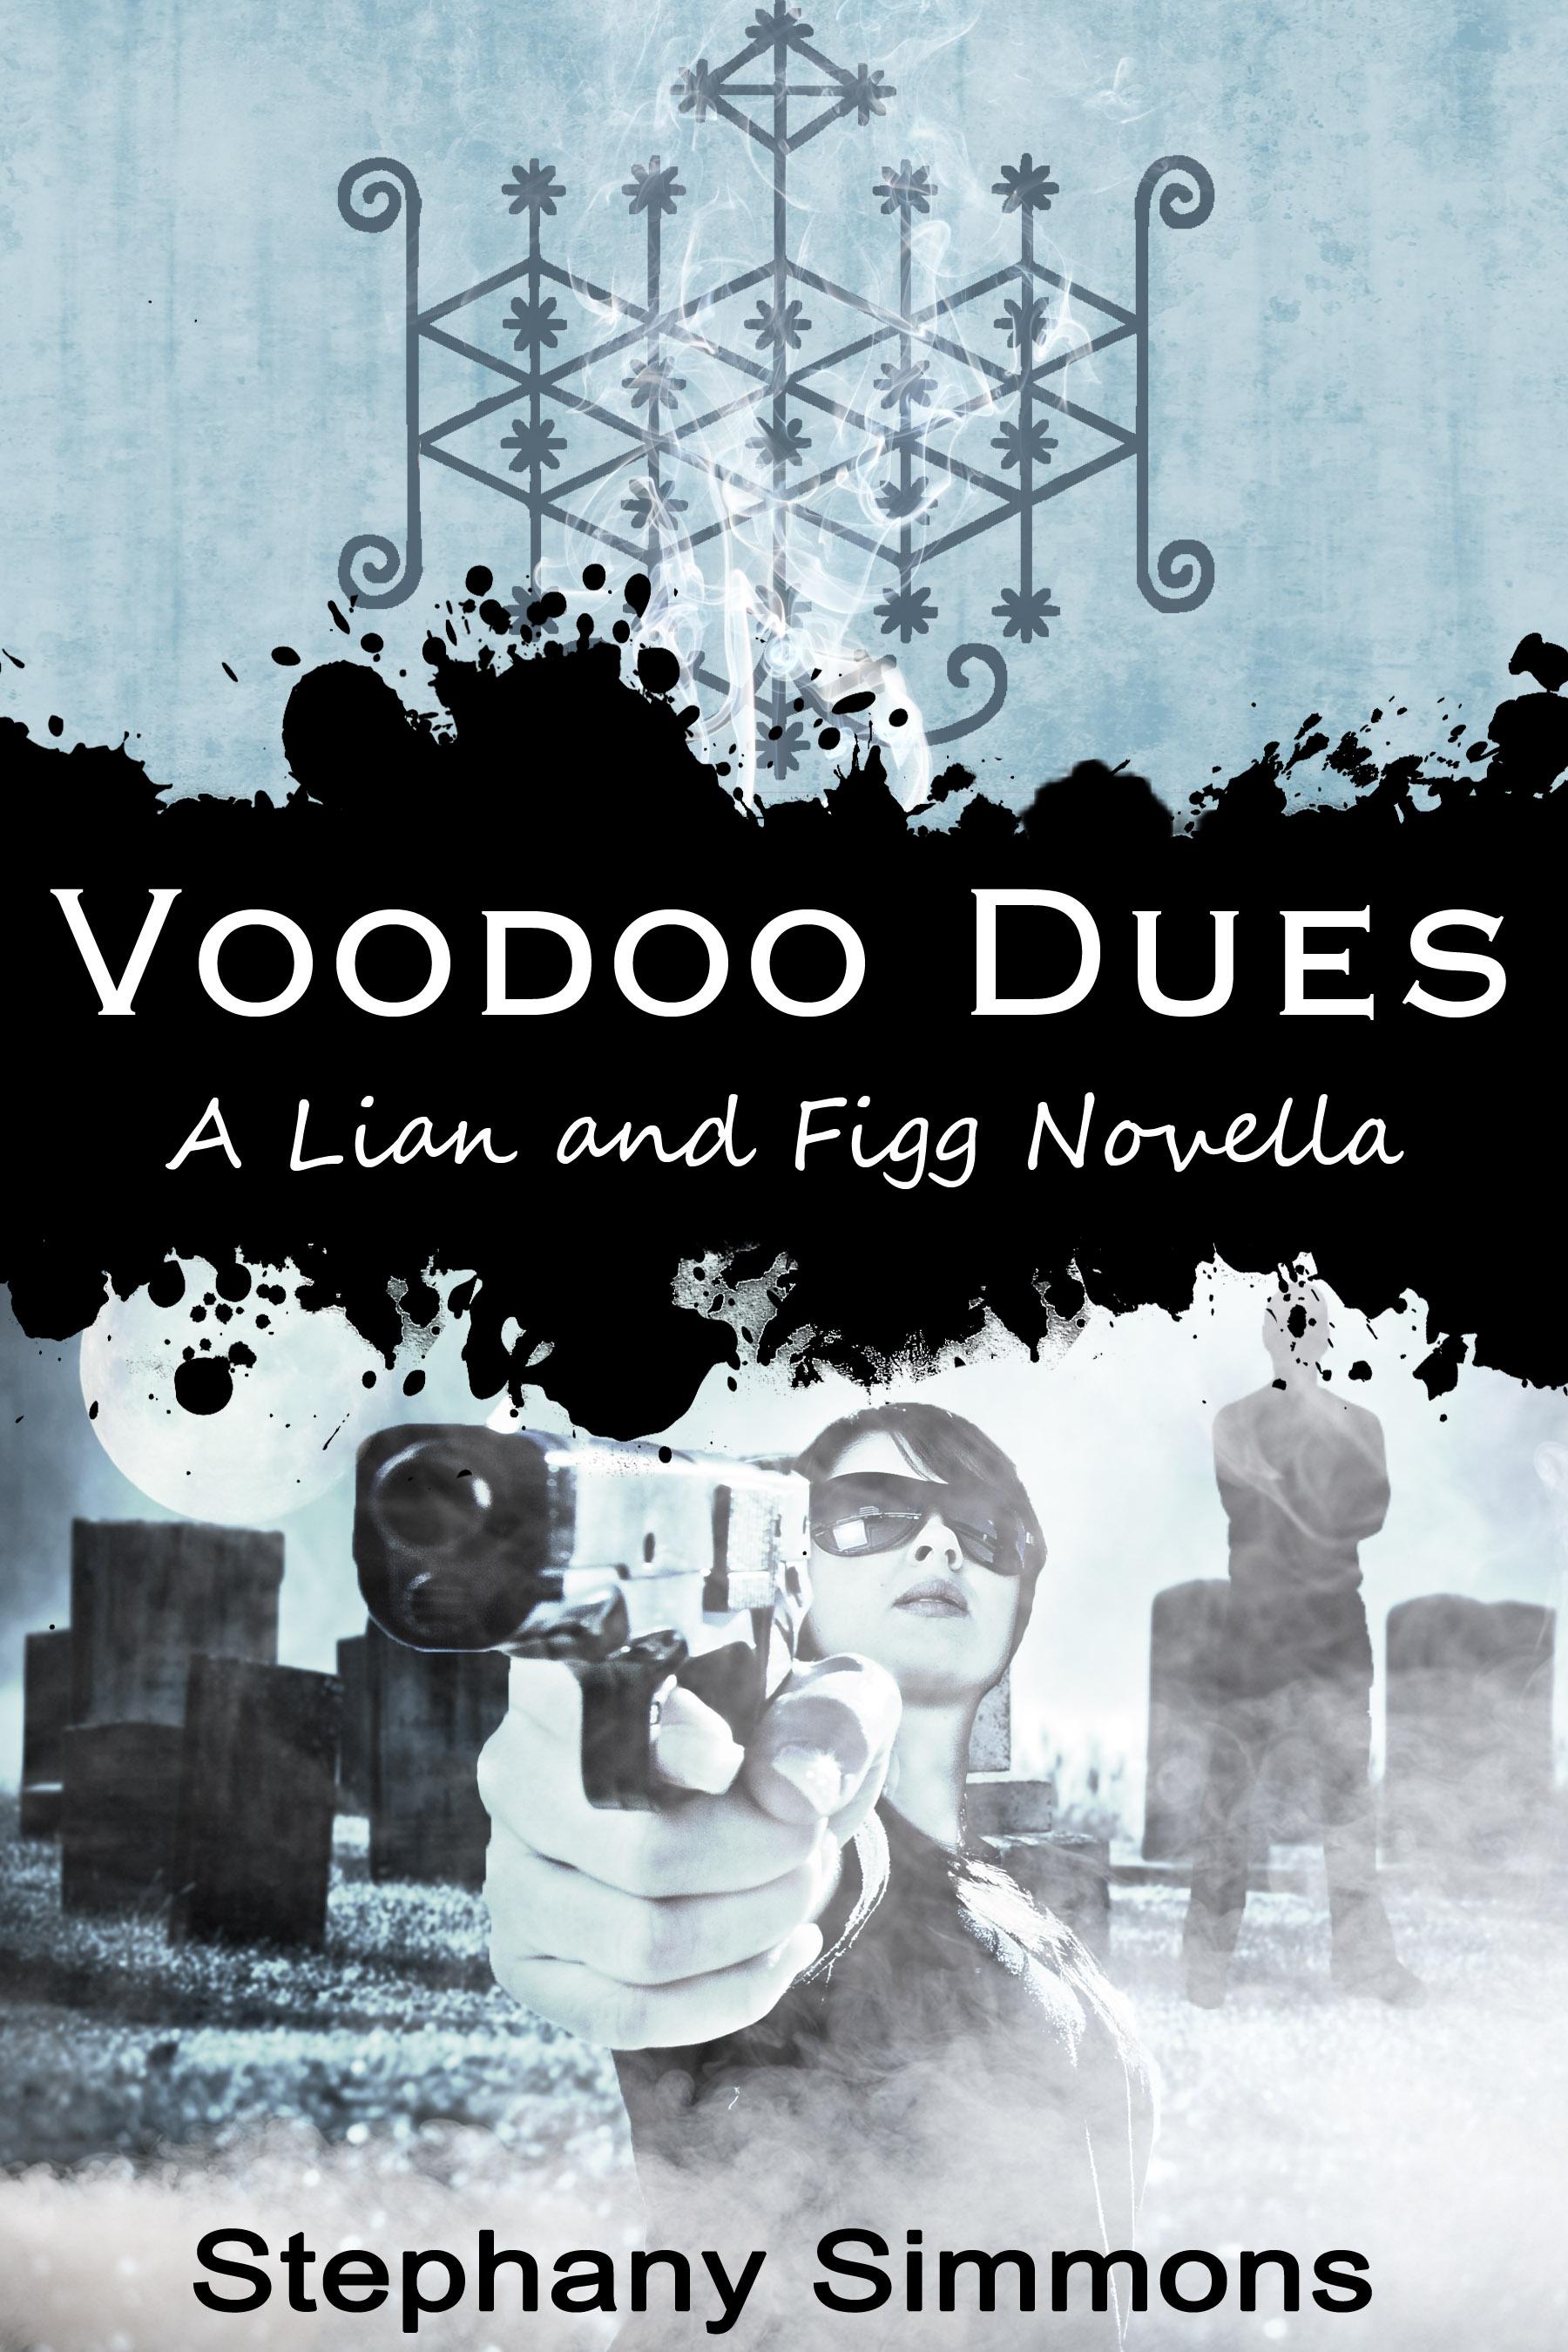 Voodoo Dues